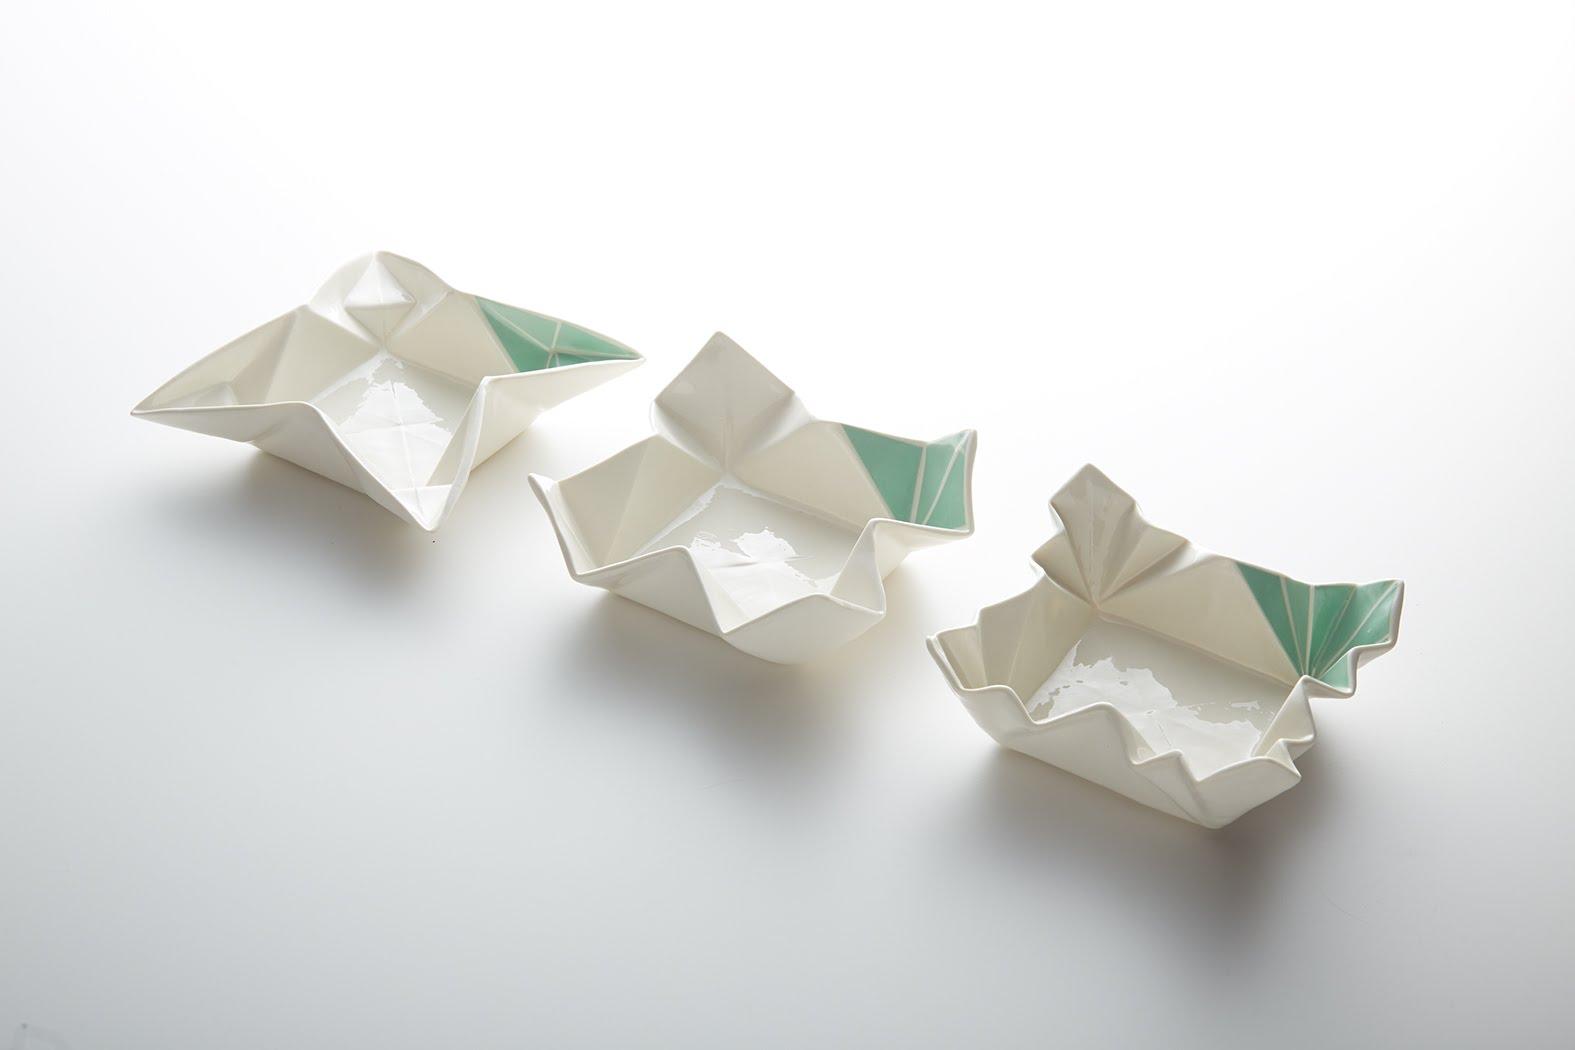 Beautifully Designed Ceramic Origami Dishware